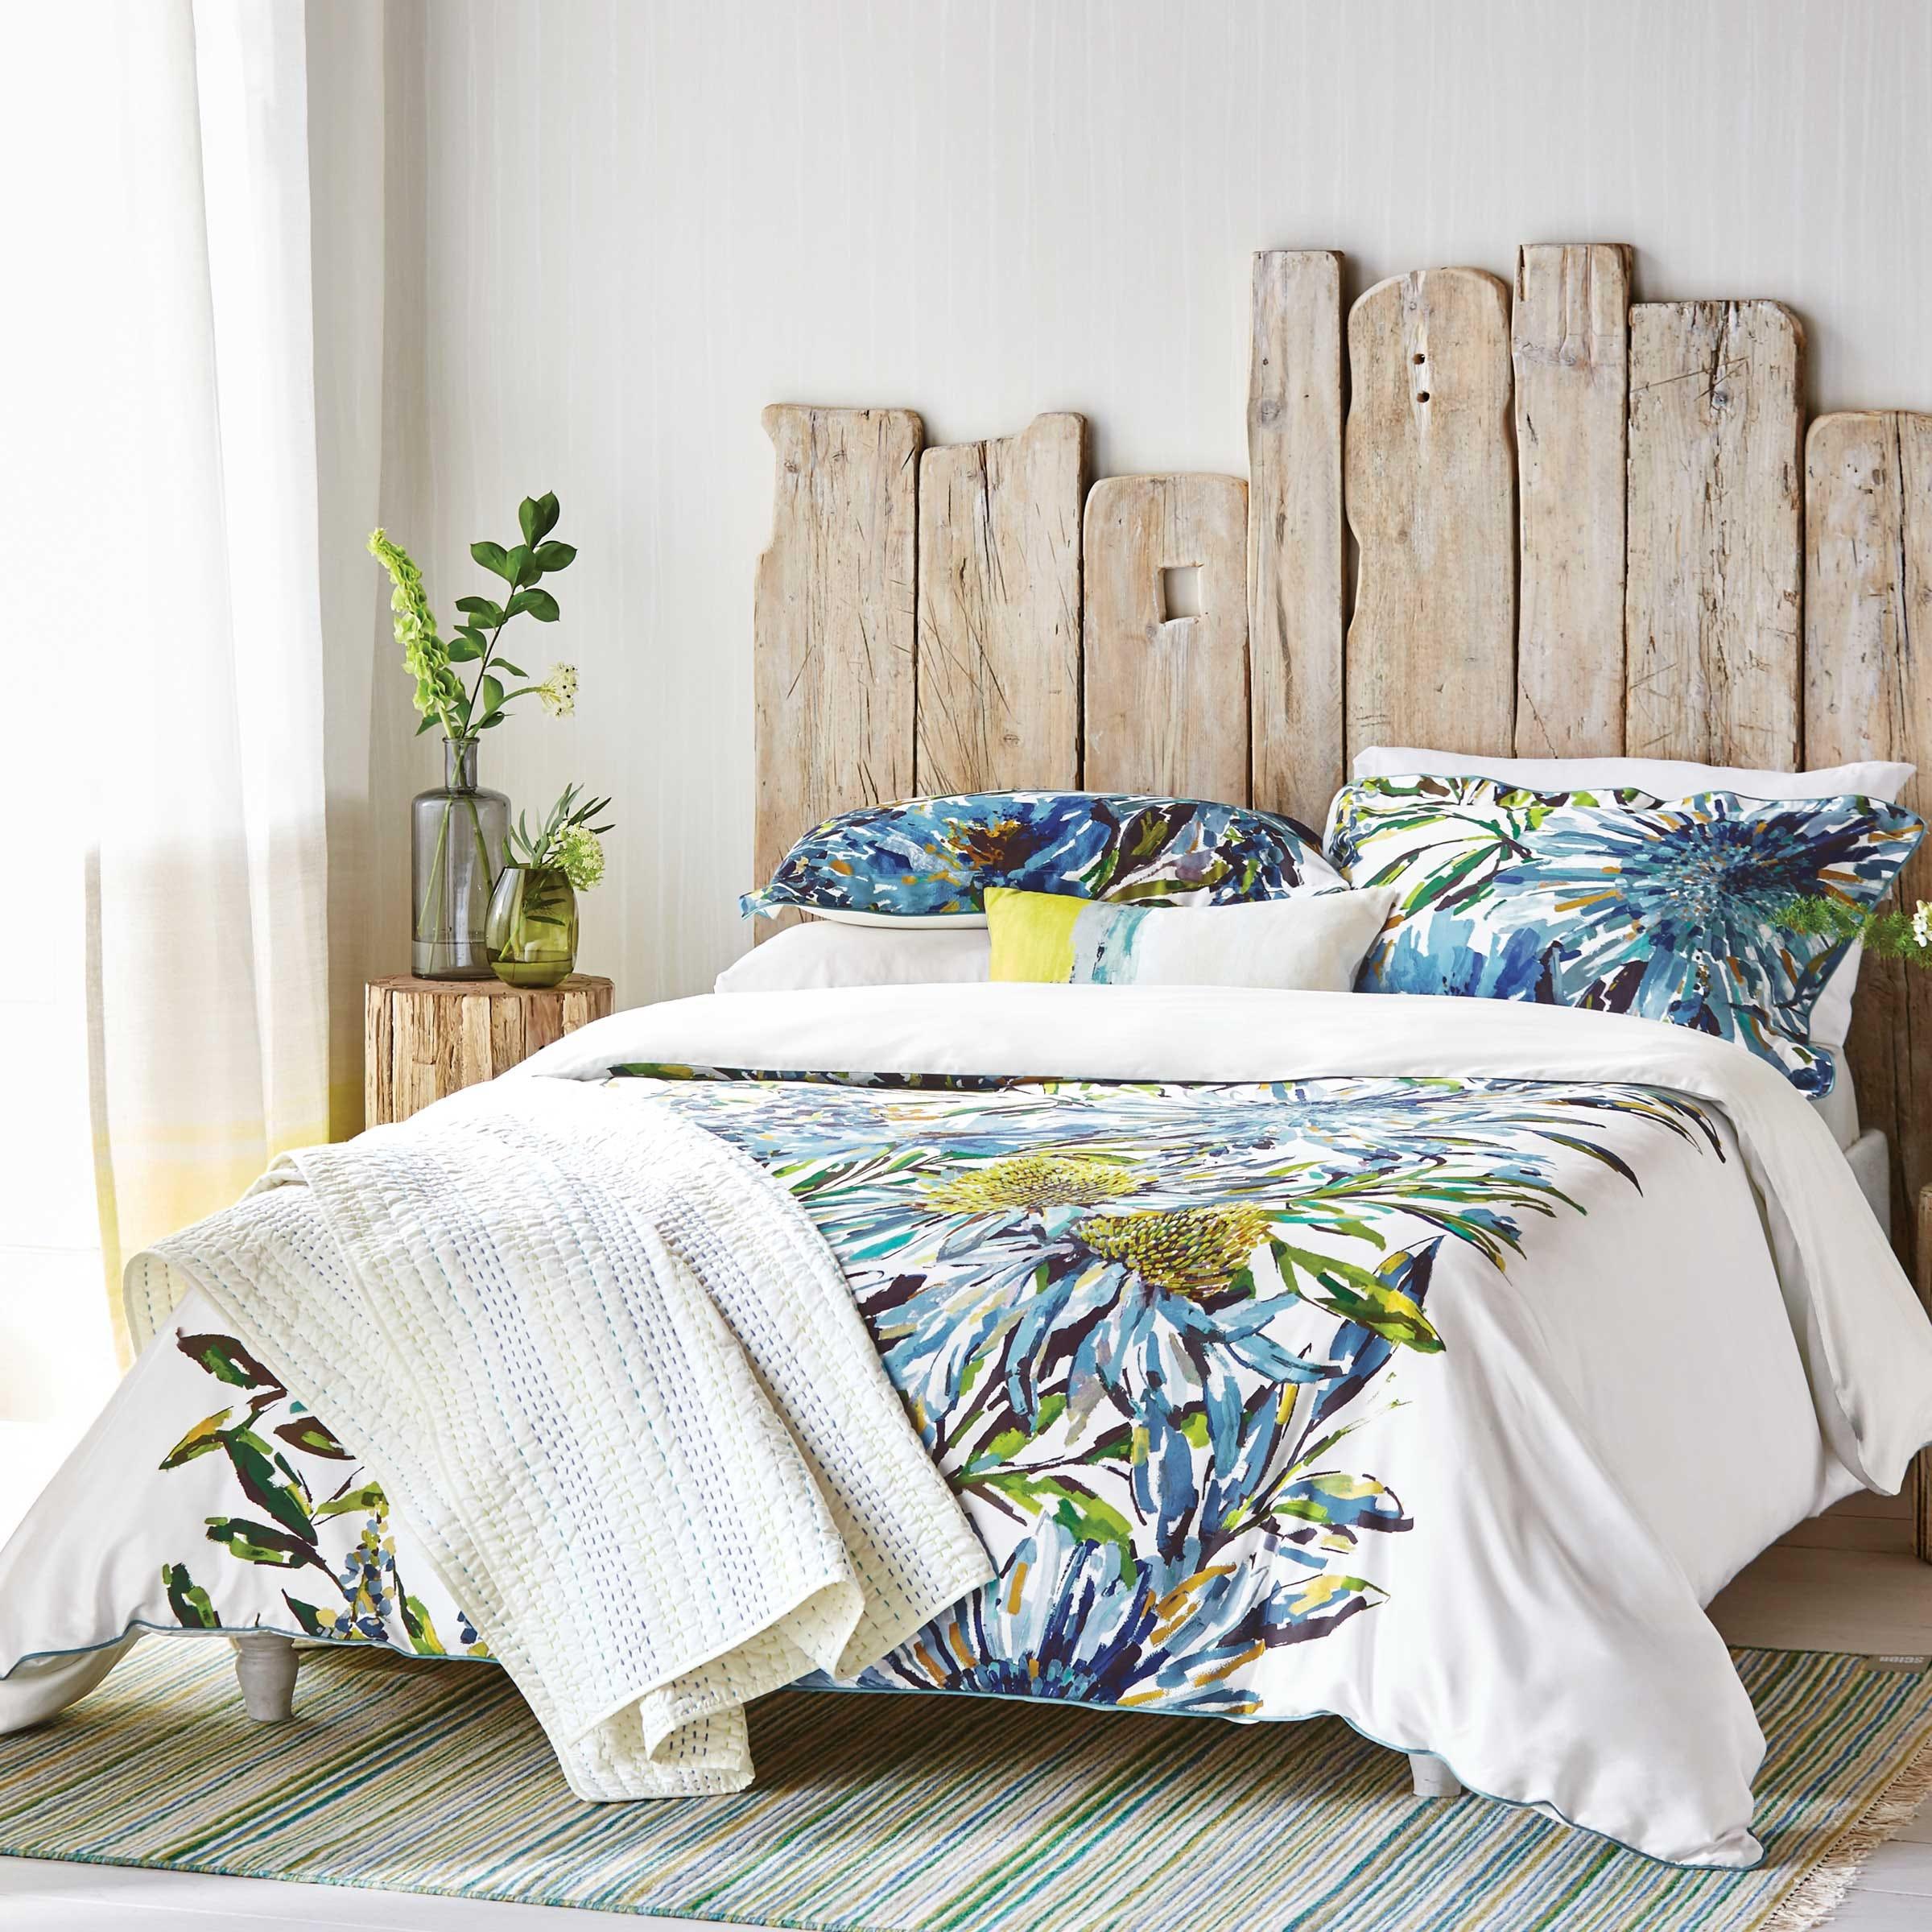 Harlequin Bedding Floreale Super Kingsize Duvet Cover ocean